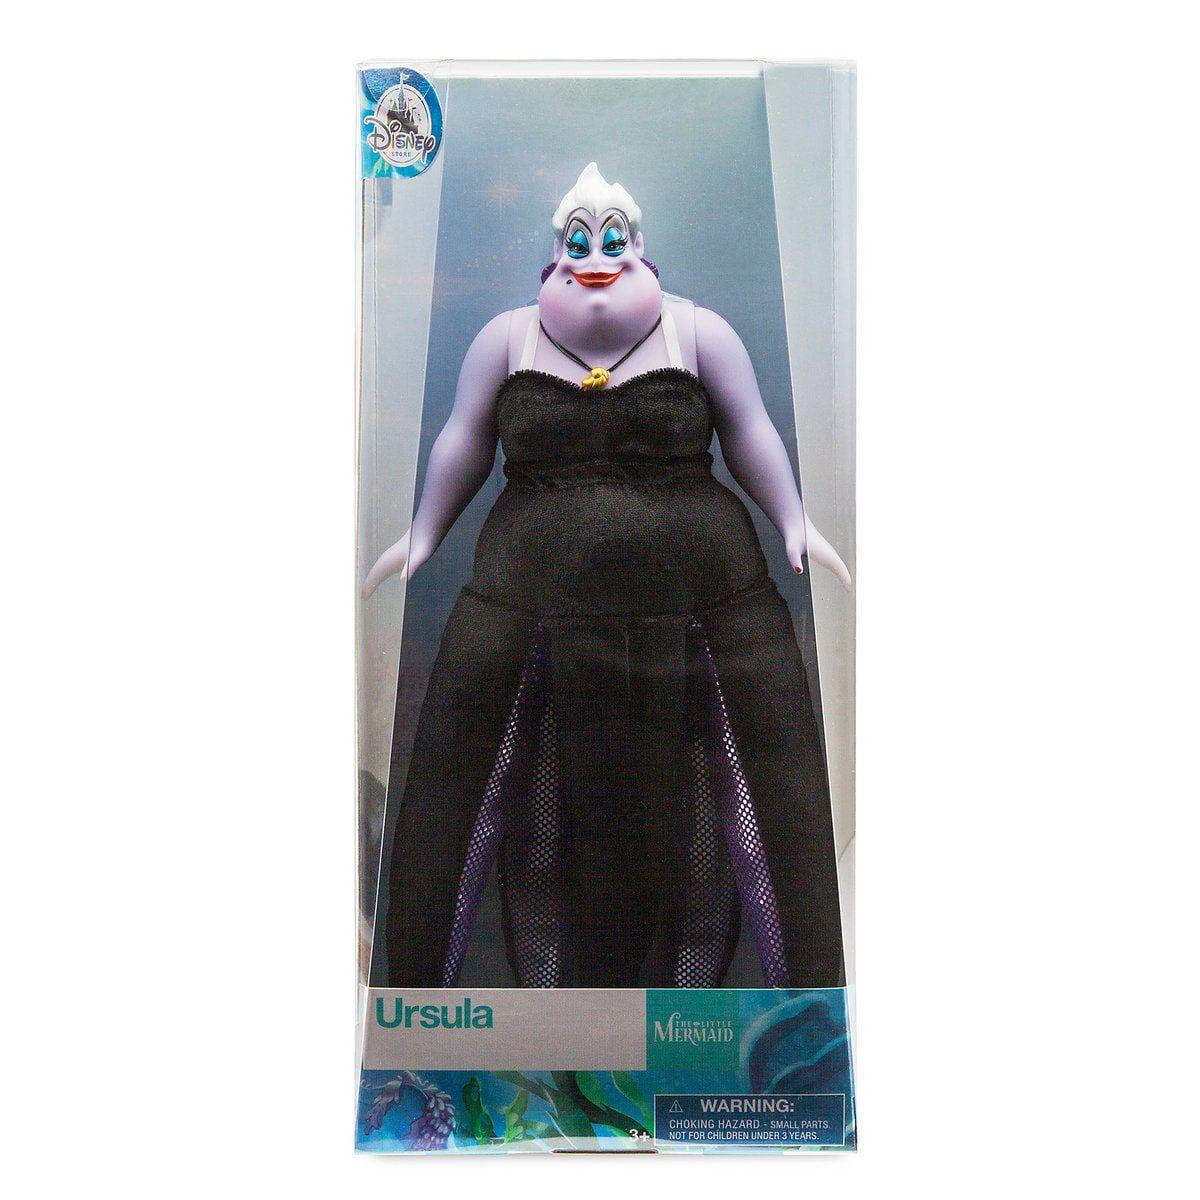 Boneca Ursula (Classic): A Pequena Sereia (The Little Mermaid) - Disney Store